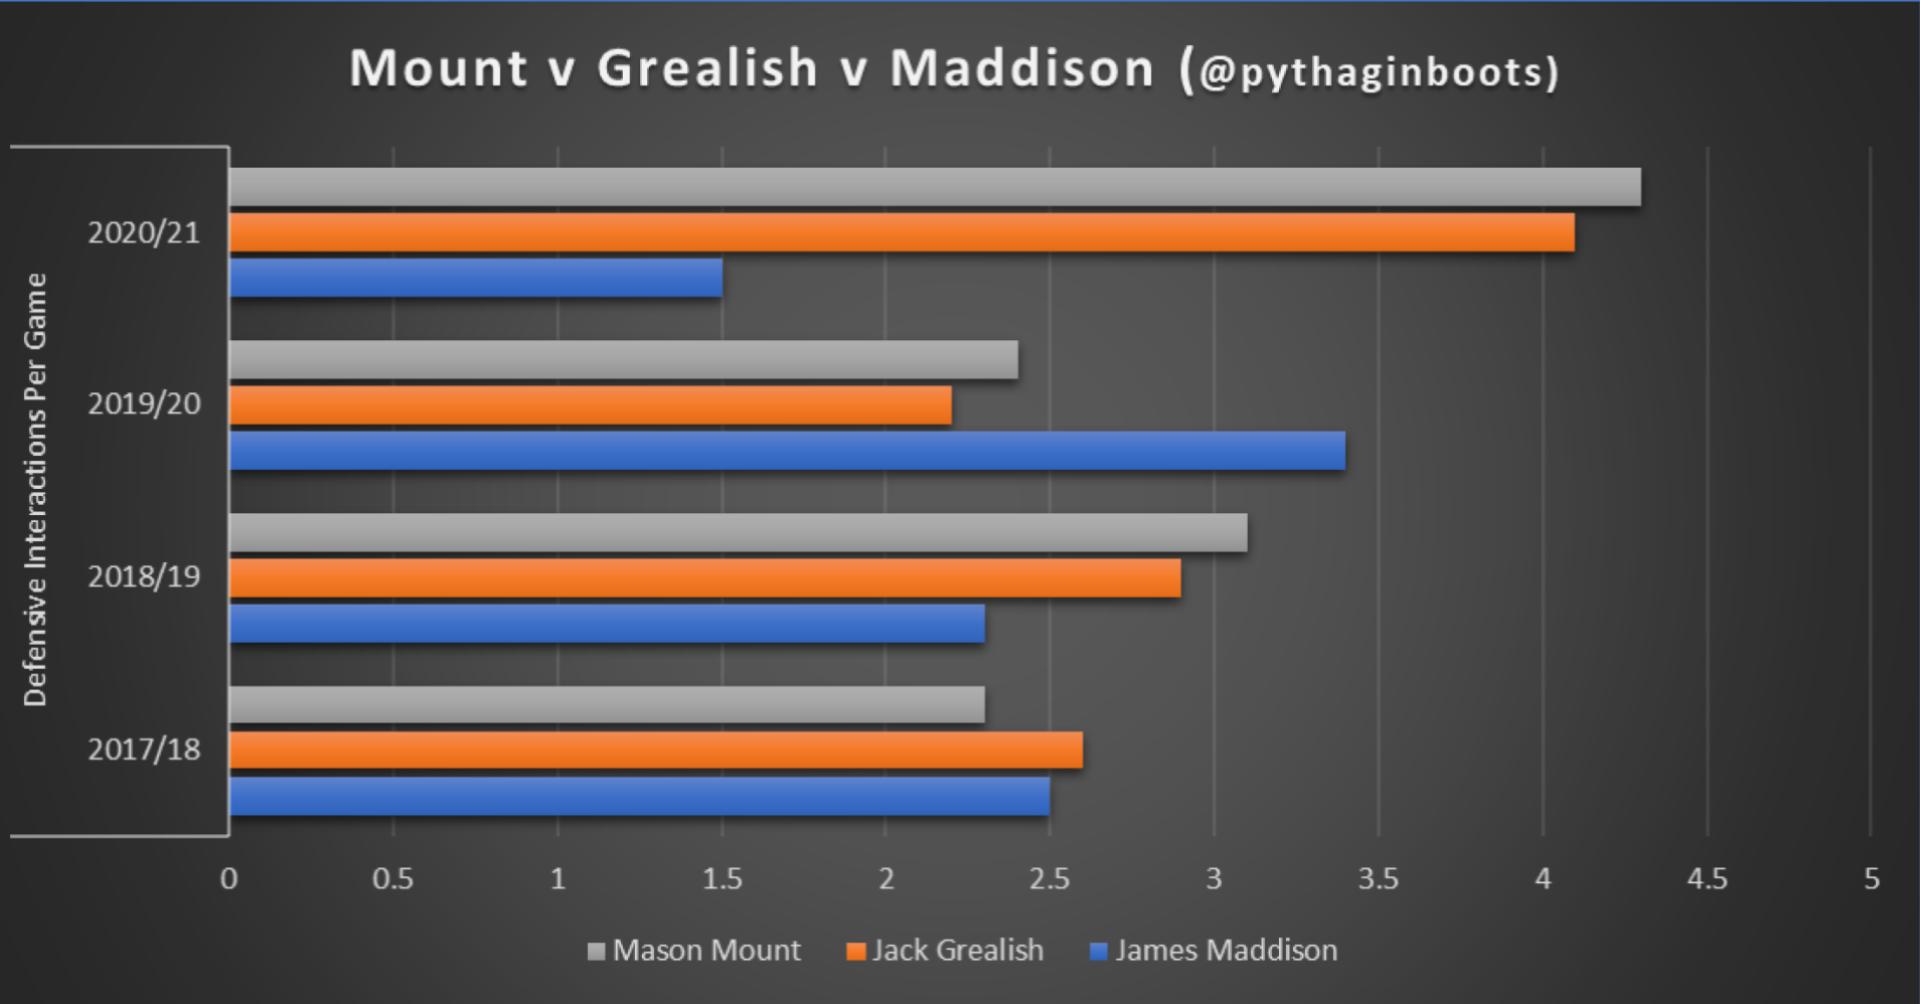 Mount v Grealish v Maddison